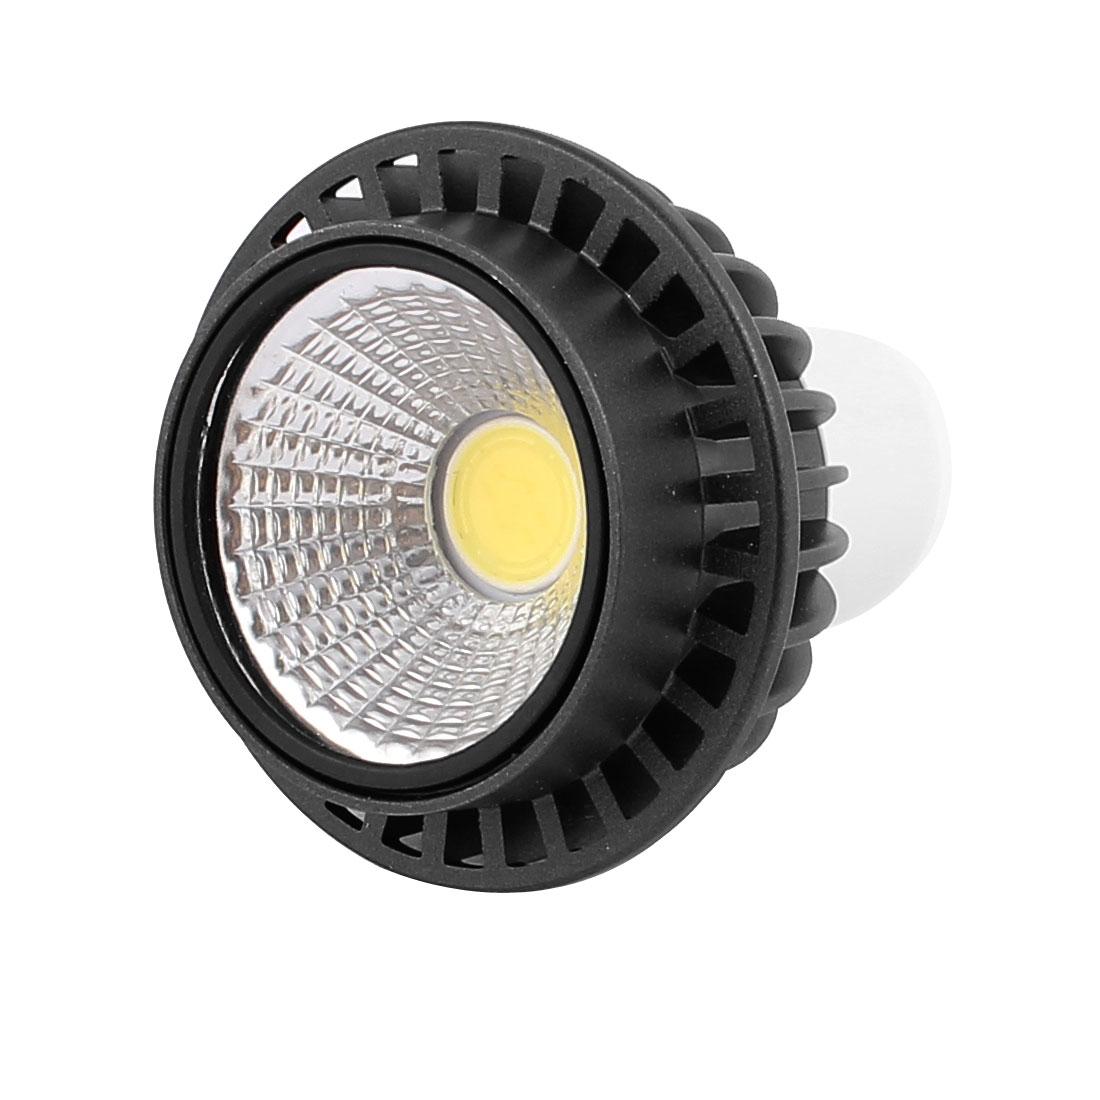 AC85-265V 3W GU5.3 COB LED Spotlight Lamp Bulb Round Downlight Pure White